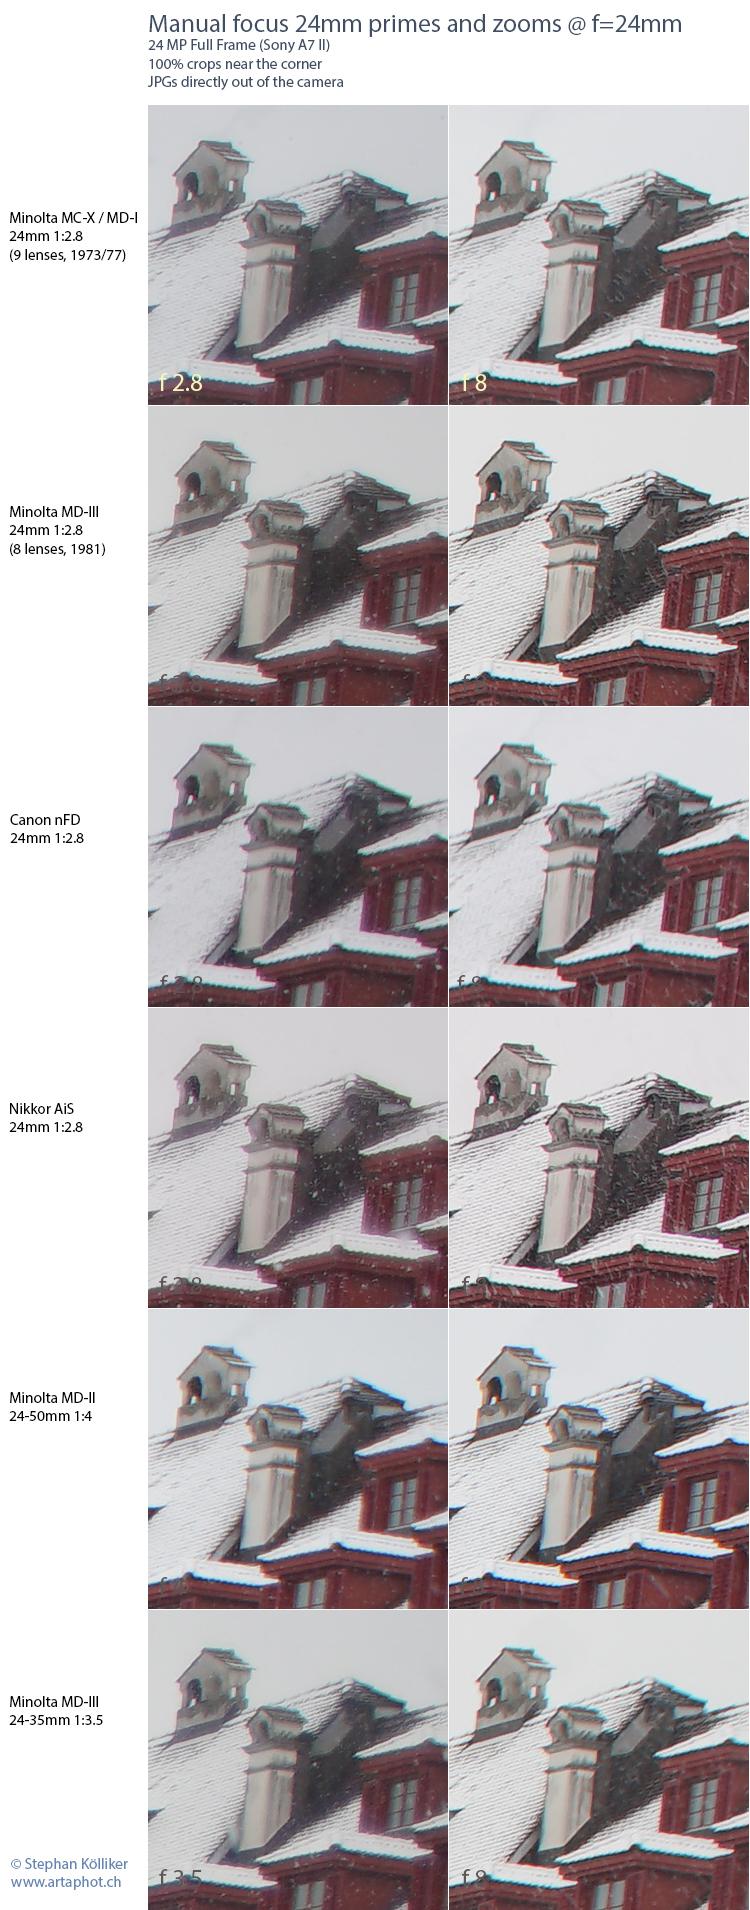 artaphot Test 24mm Primes Zooms MF near corner